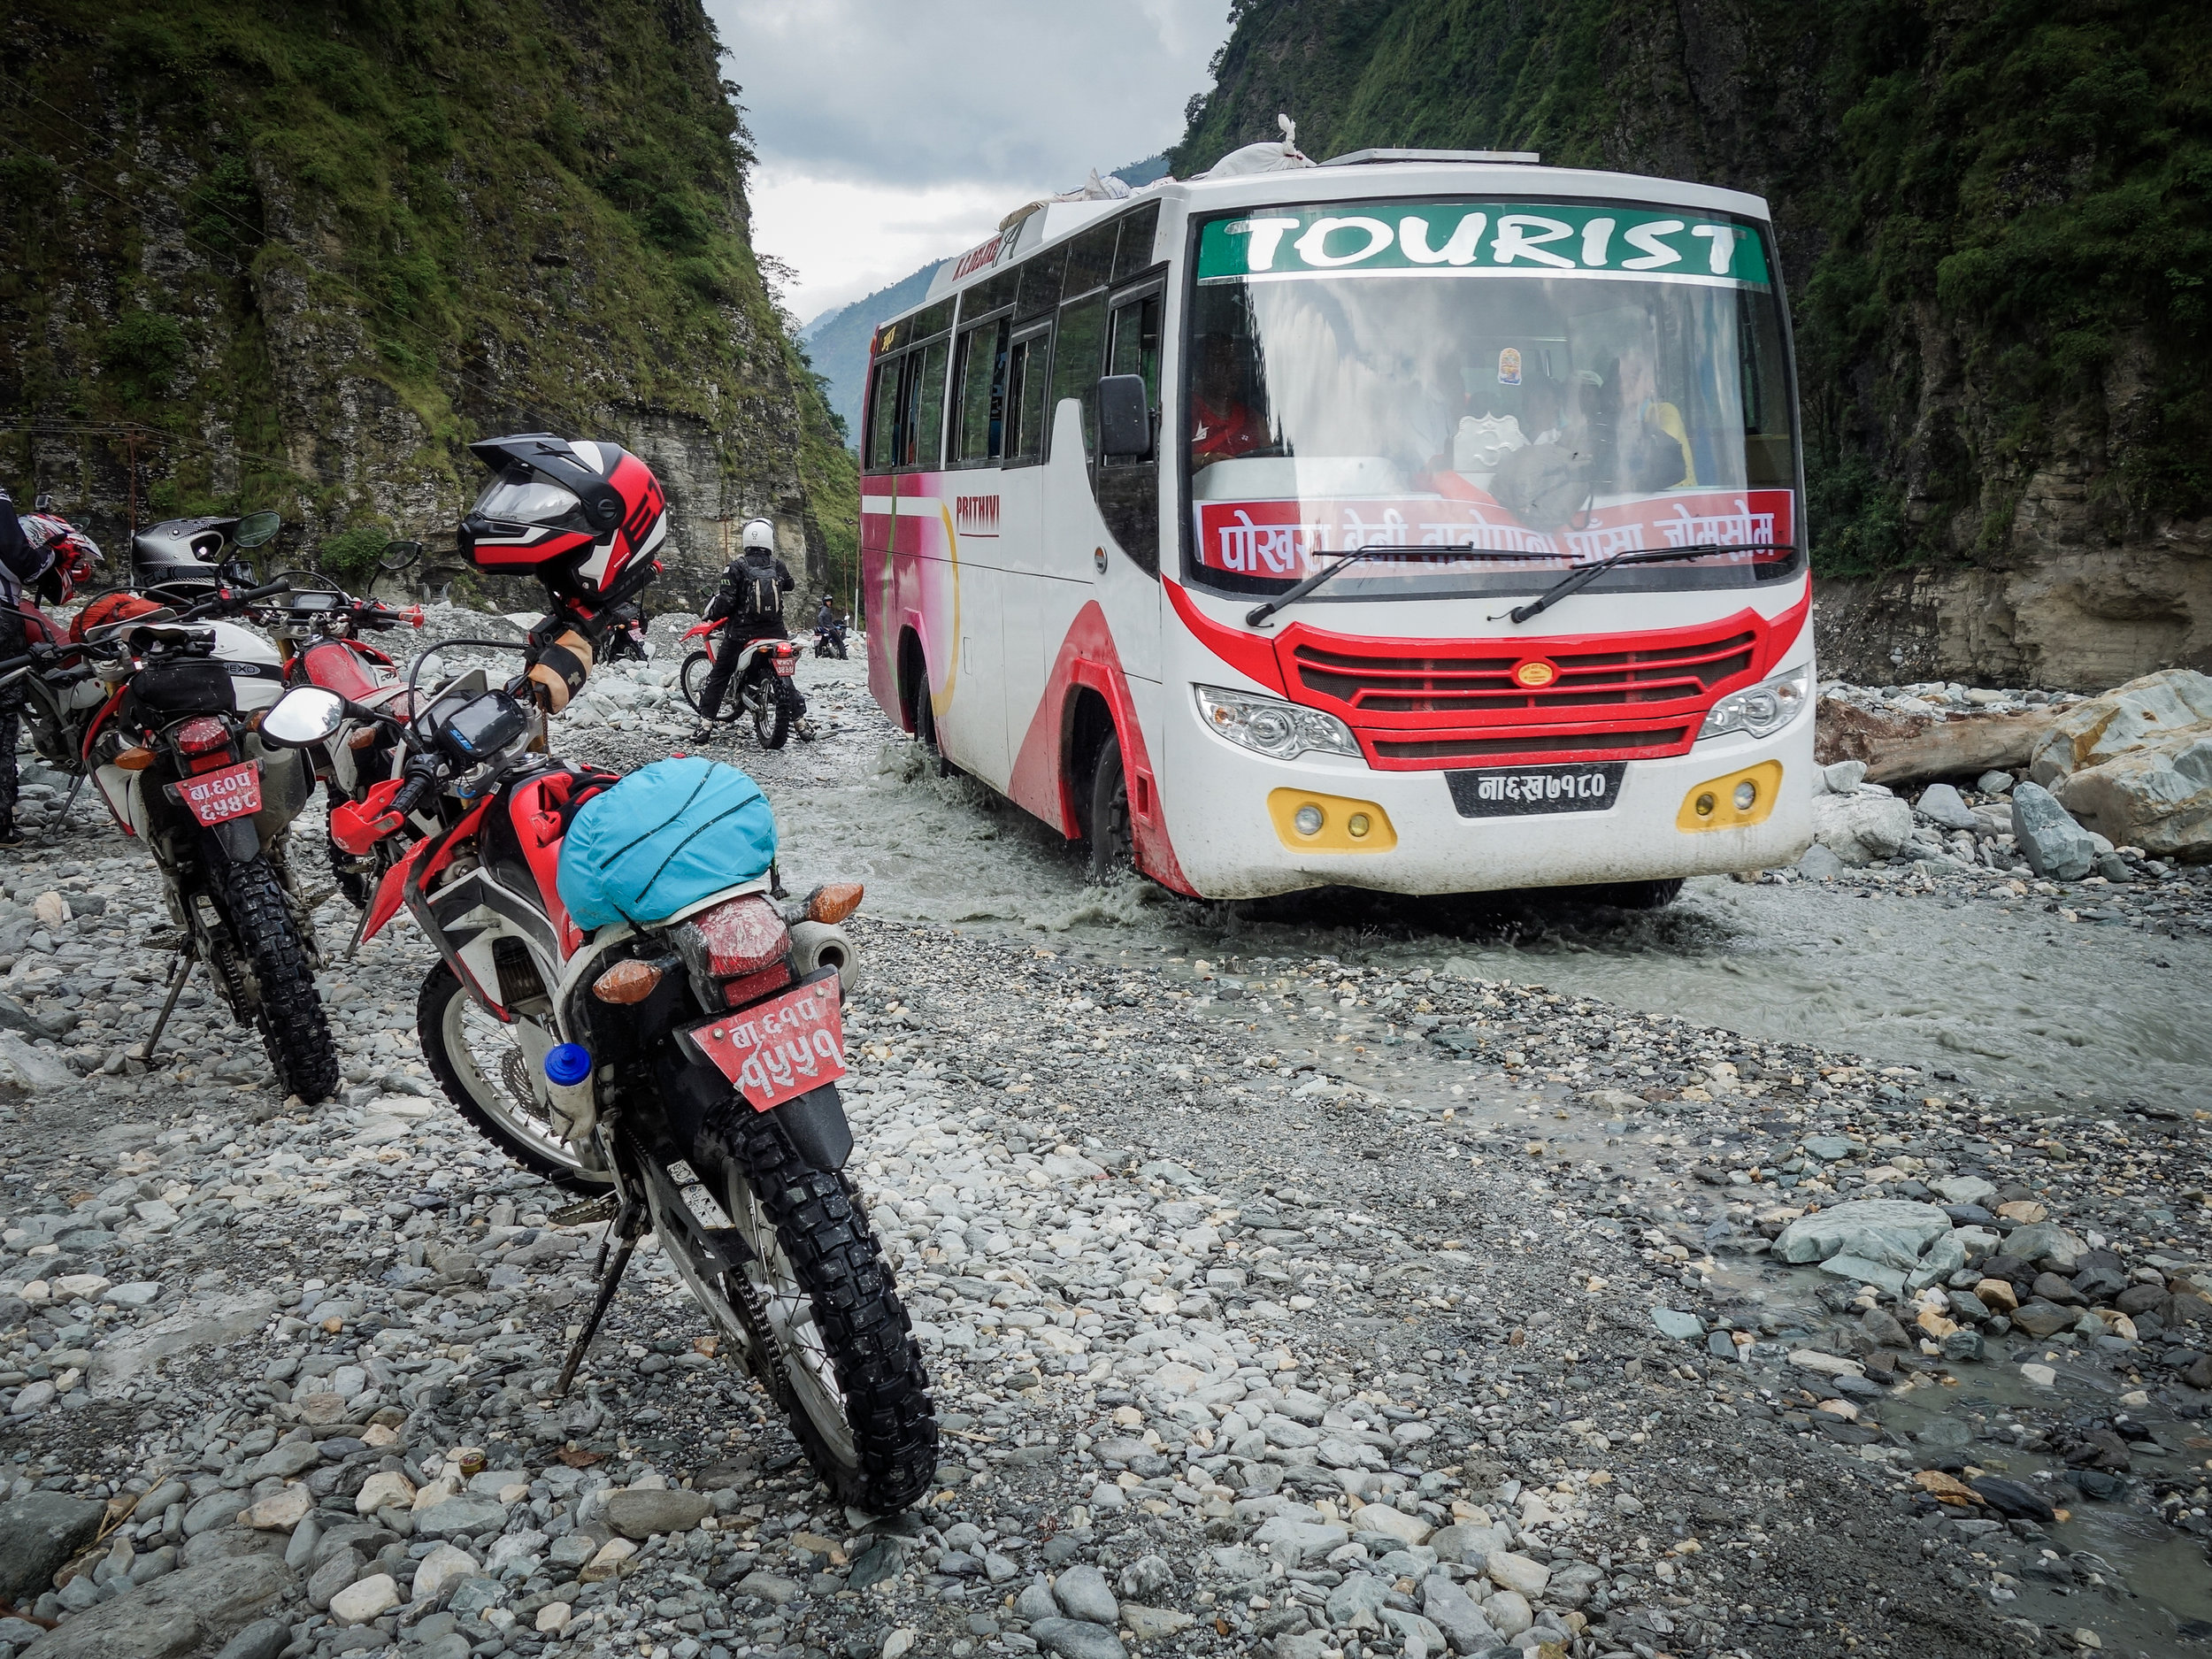 TWHMC-nepal-motorcycle-adventure-2016-03871-2.jpg